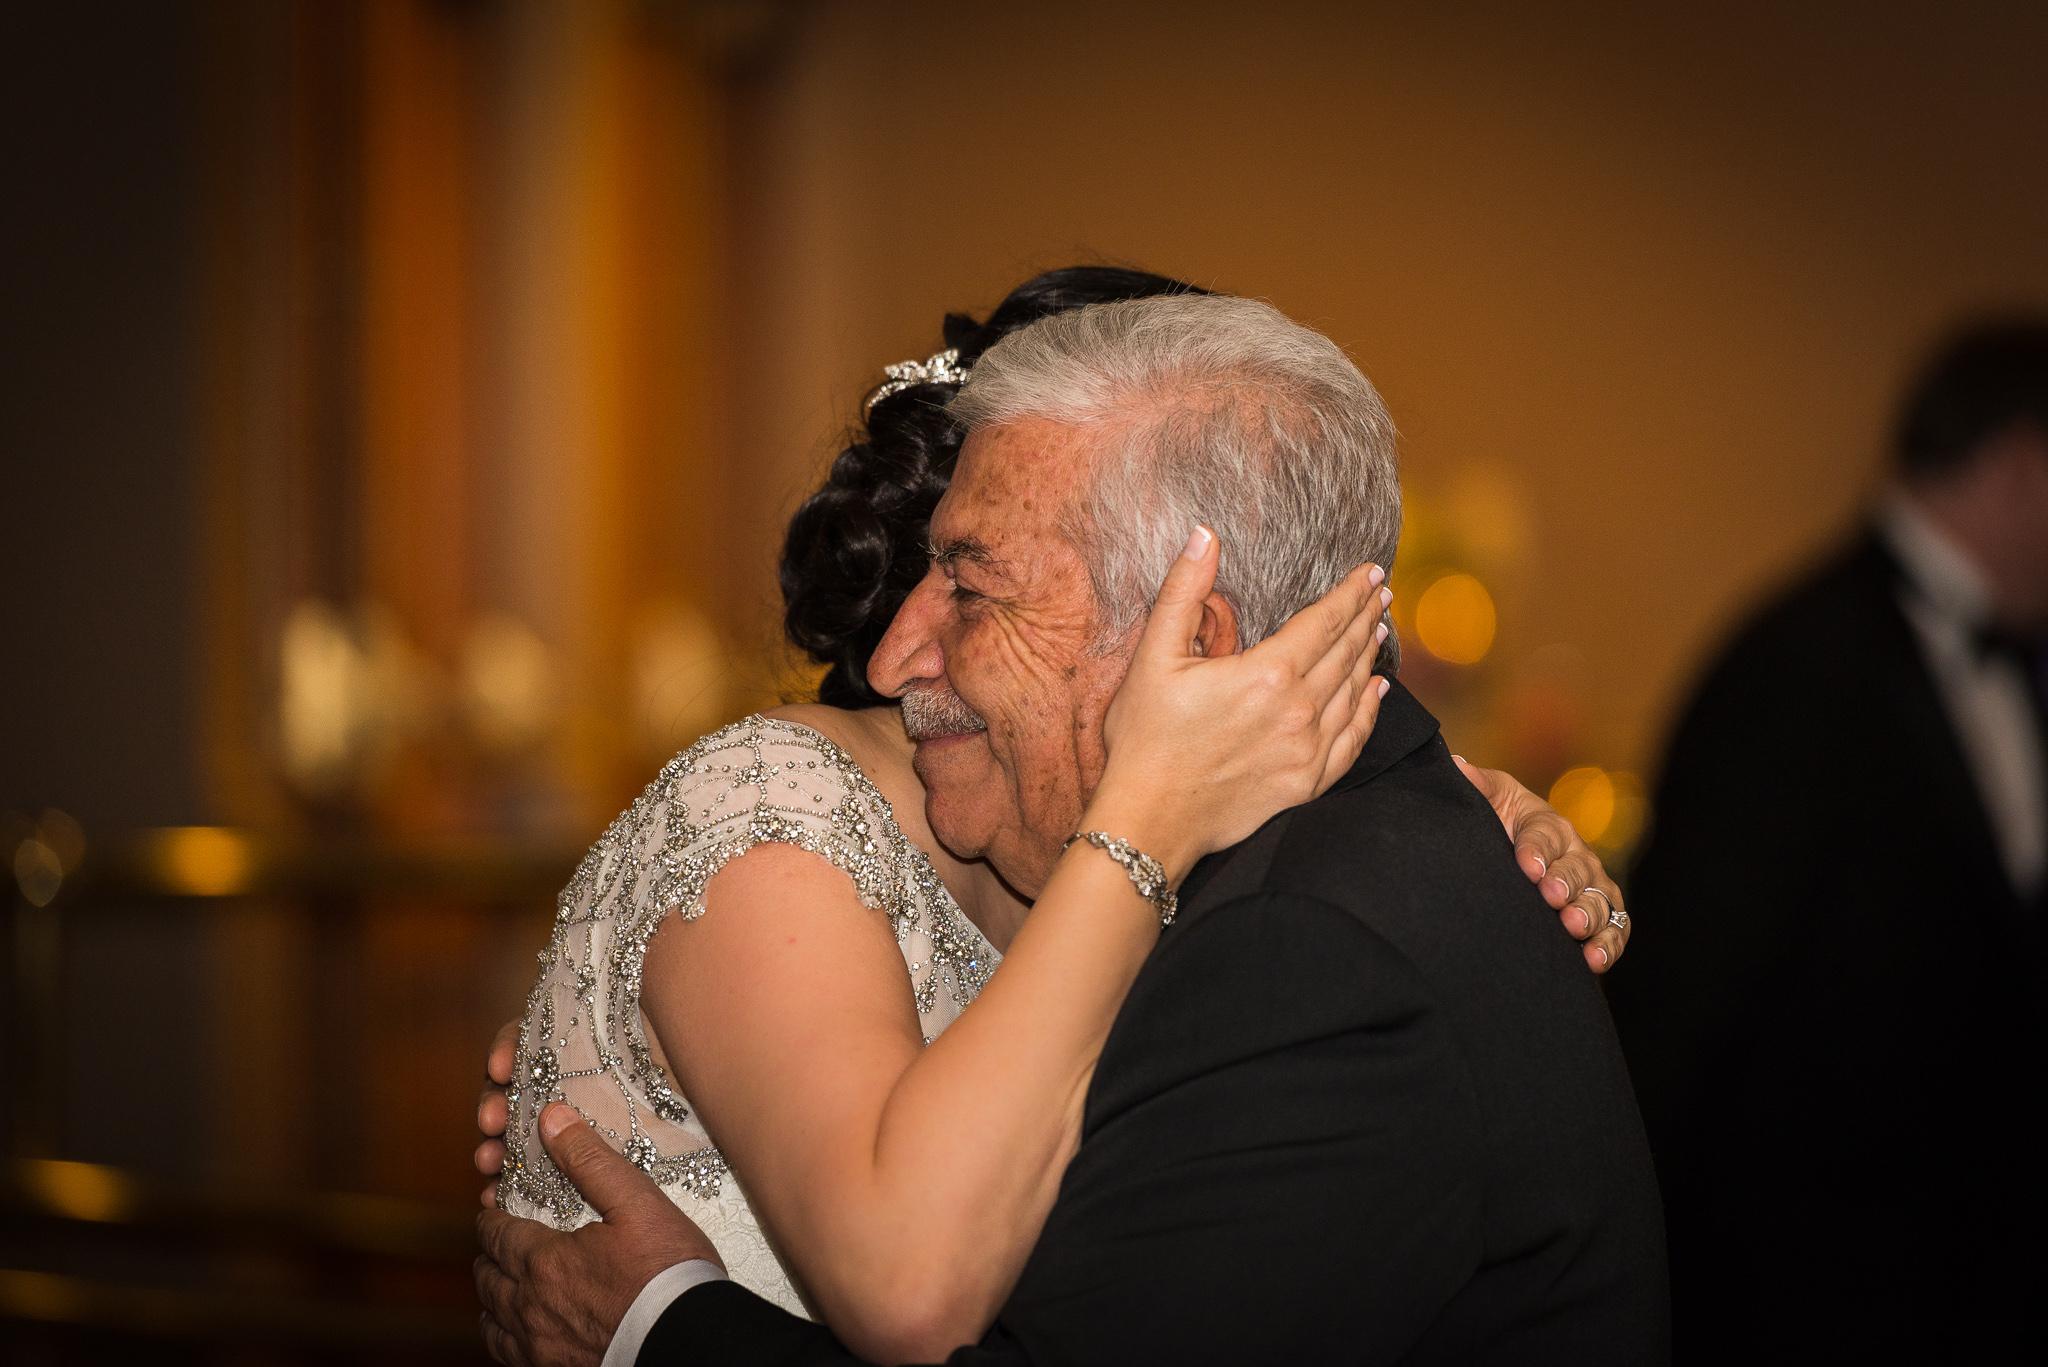 Nil-poconos-engagement-wedding-photographer-5.jpg